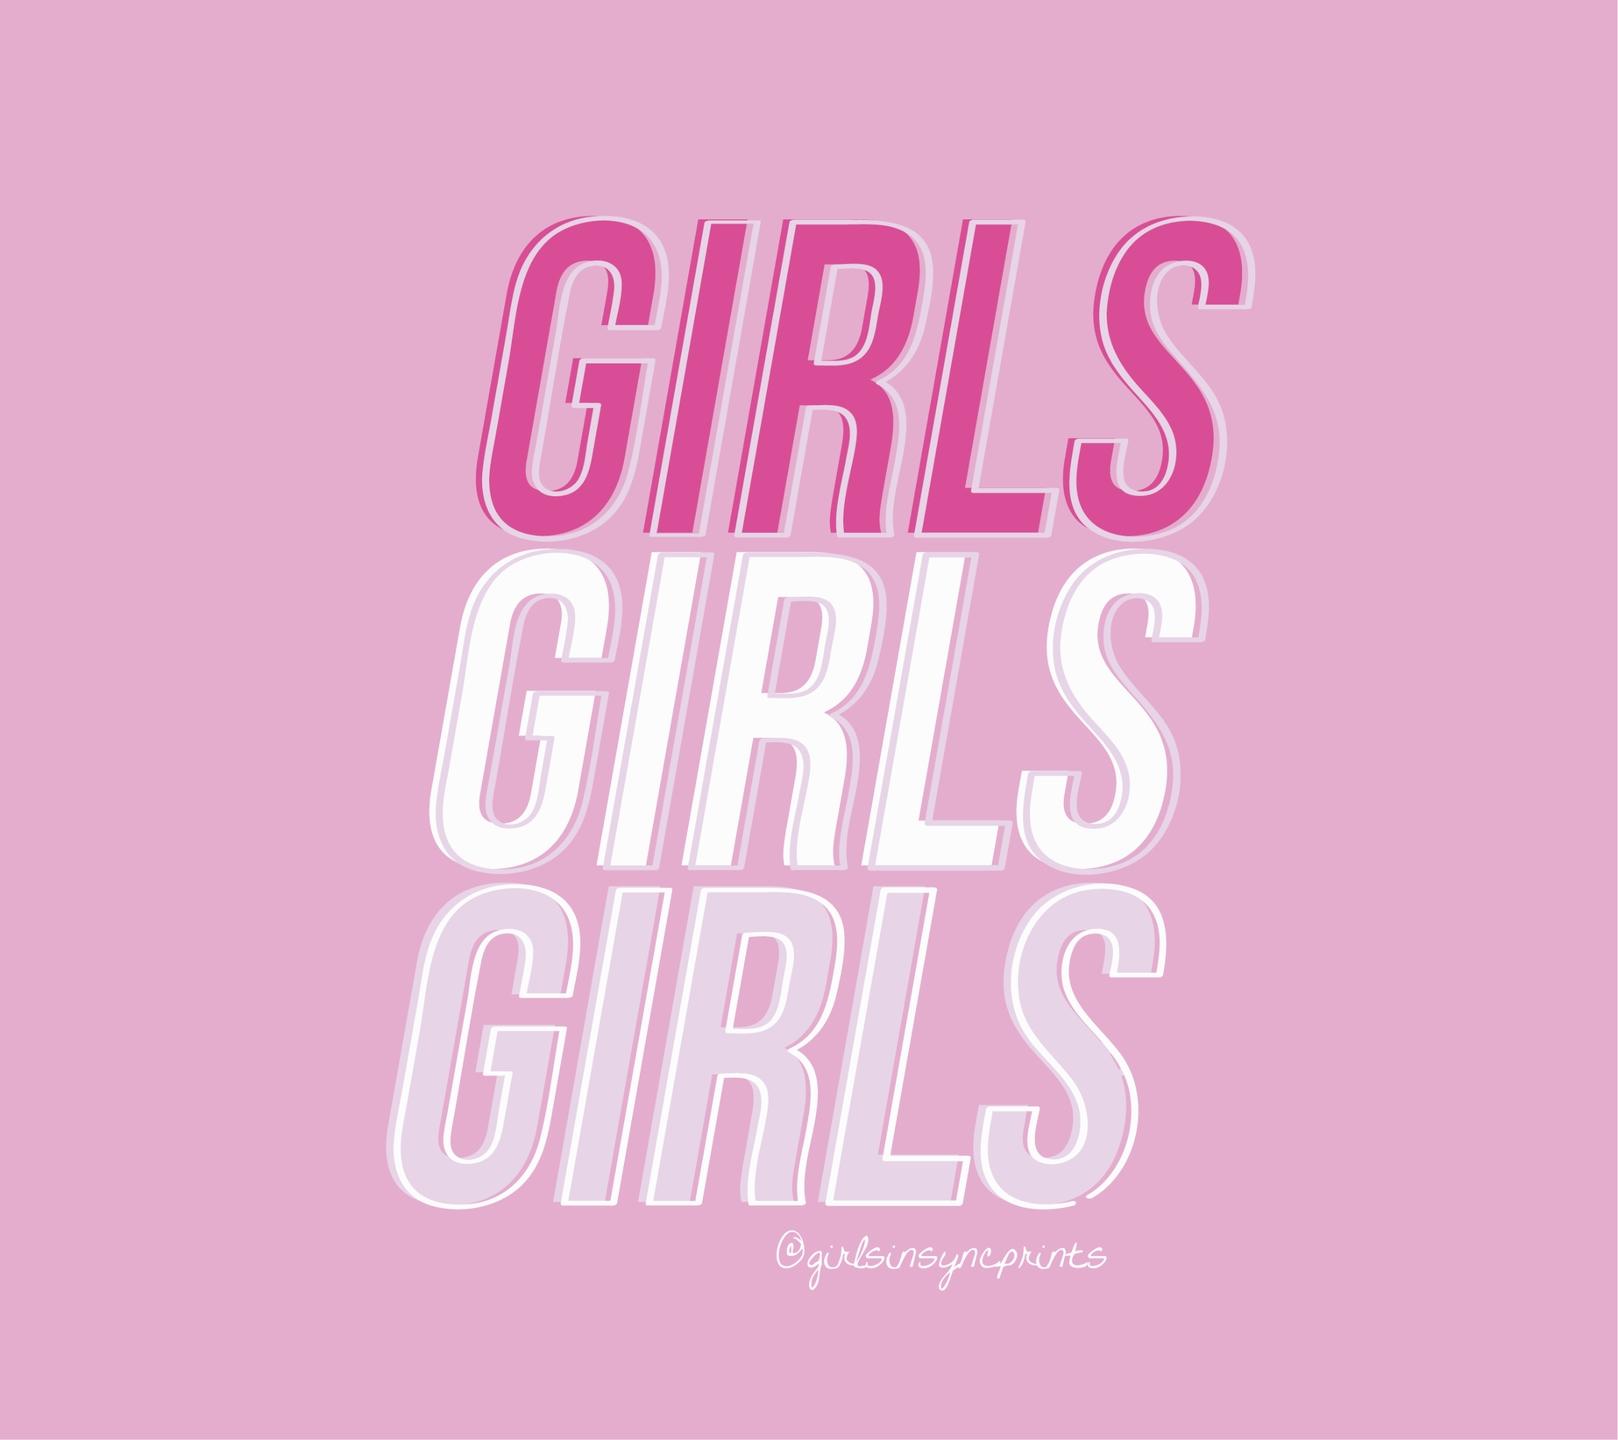 girlsinsync (@girlsinsyncprints) Cover Image